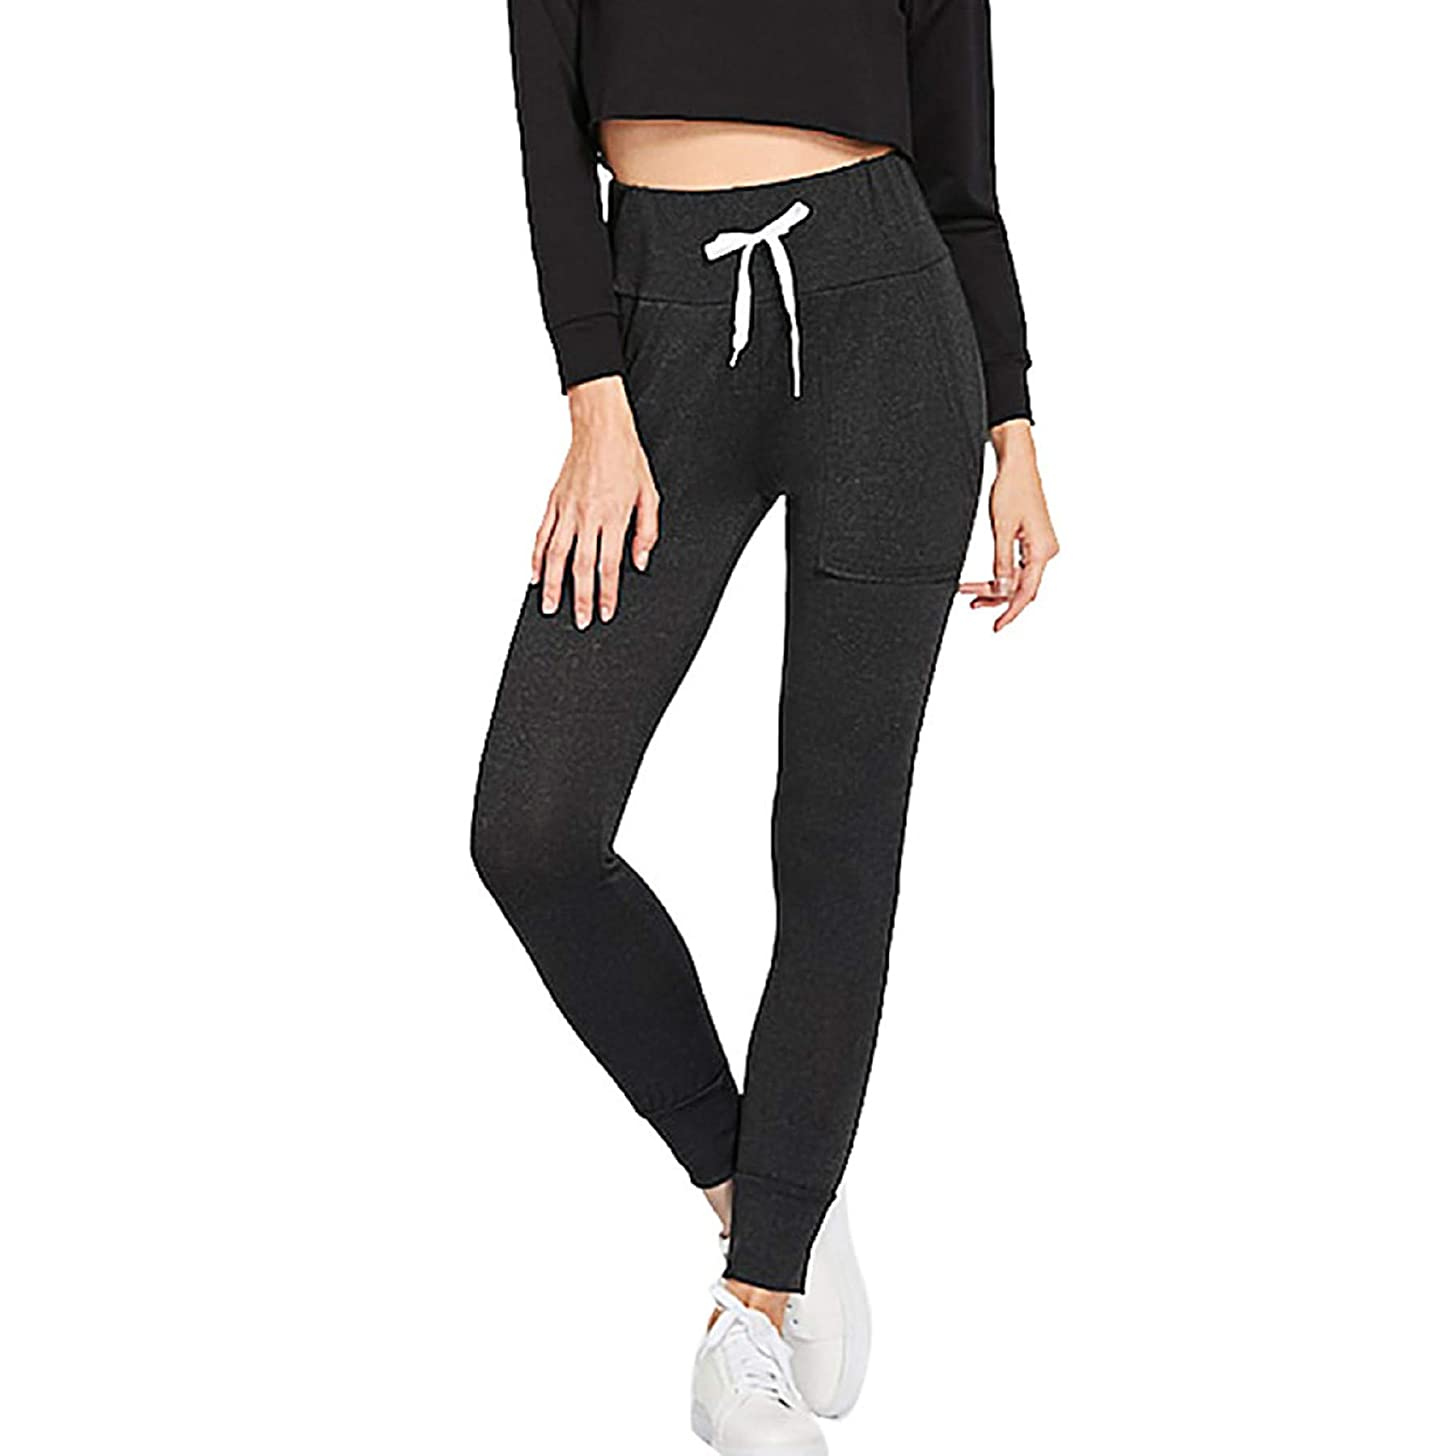 Women's Trousers,Women's Drawstring Elastic Waist Pocket Leggings High Waist Slim Fit Yoga Pants